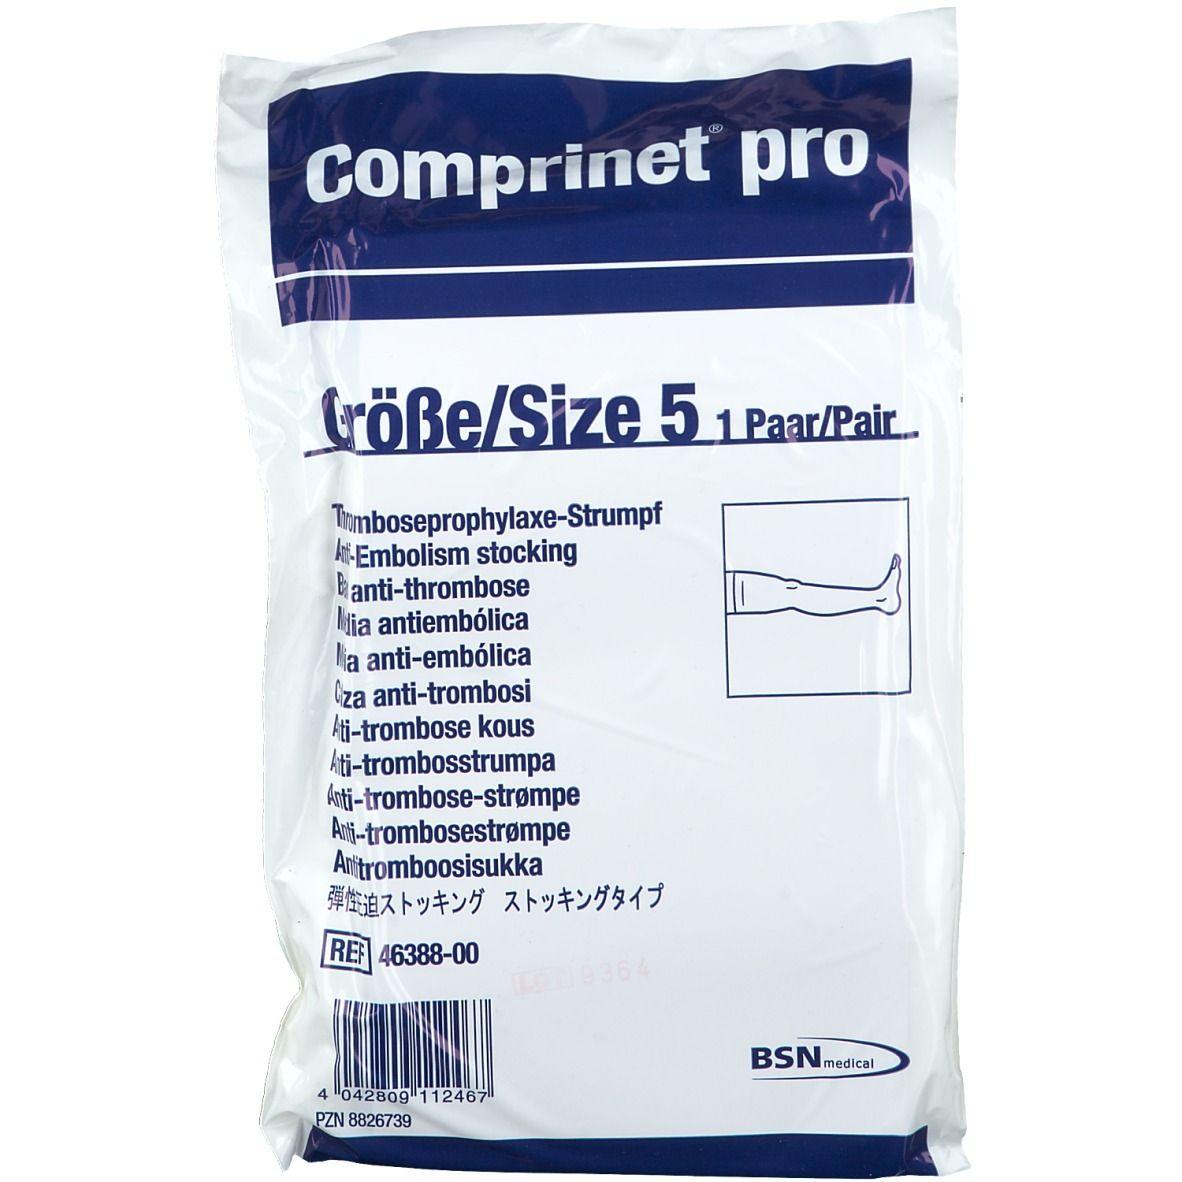 Comprinet® pro Strumpf oberschenkellang Gr. 5